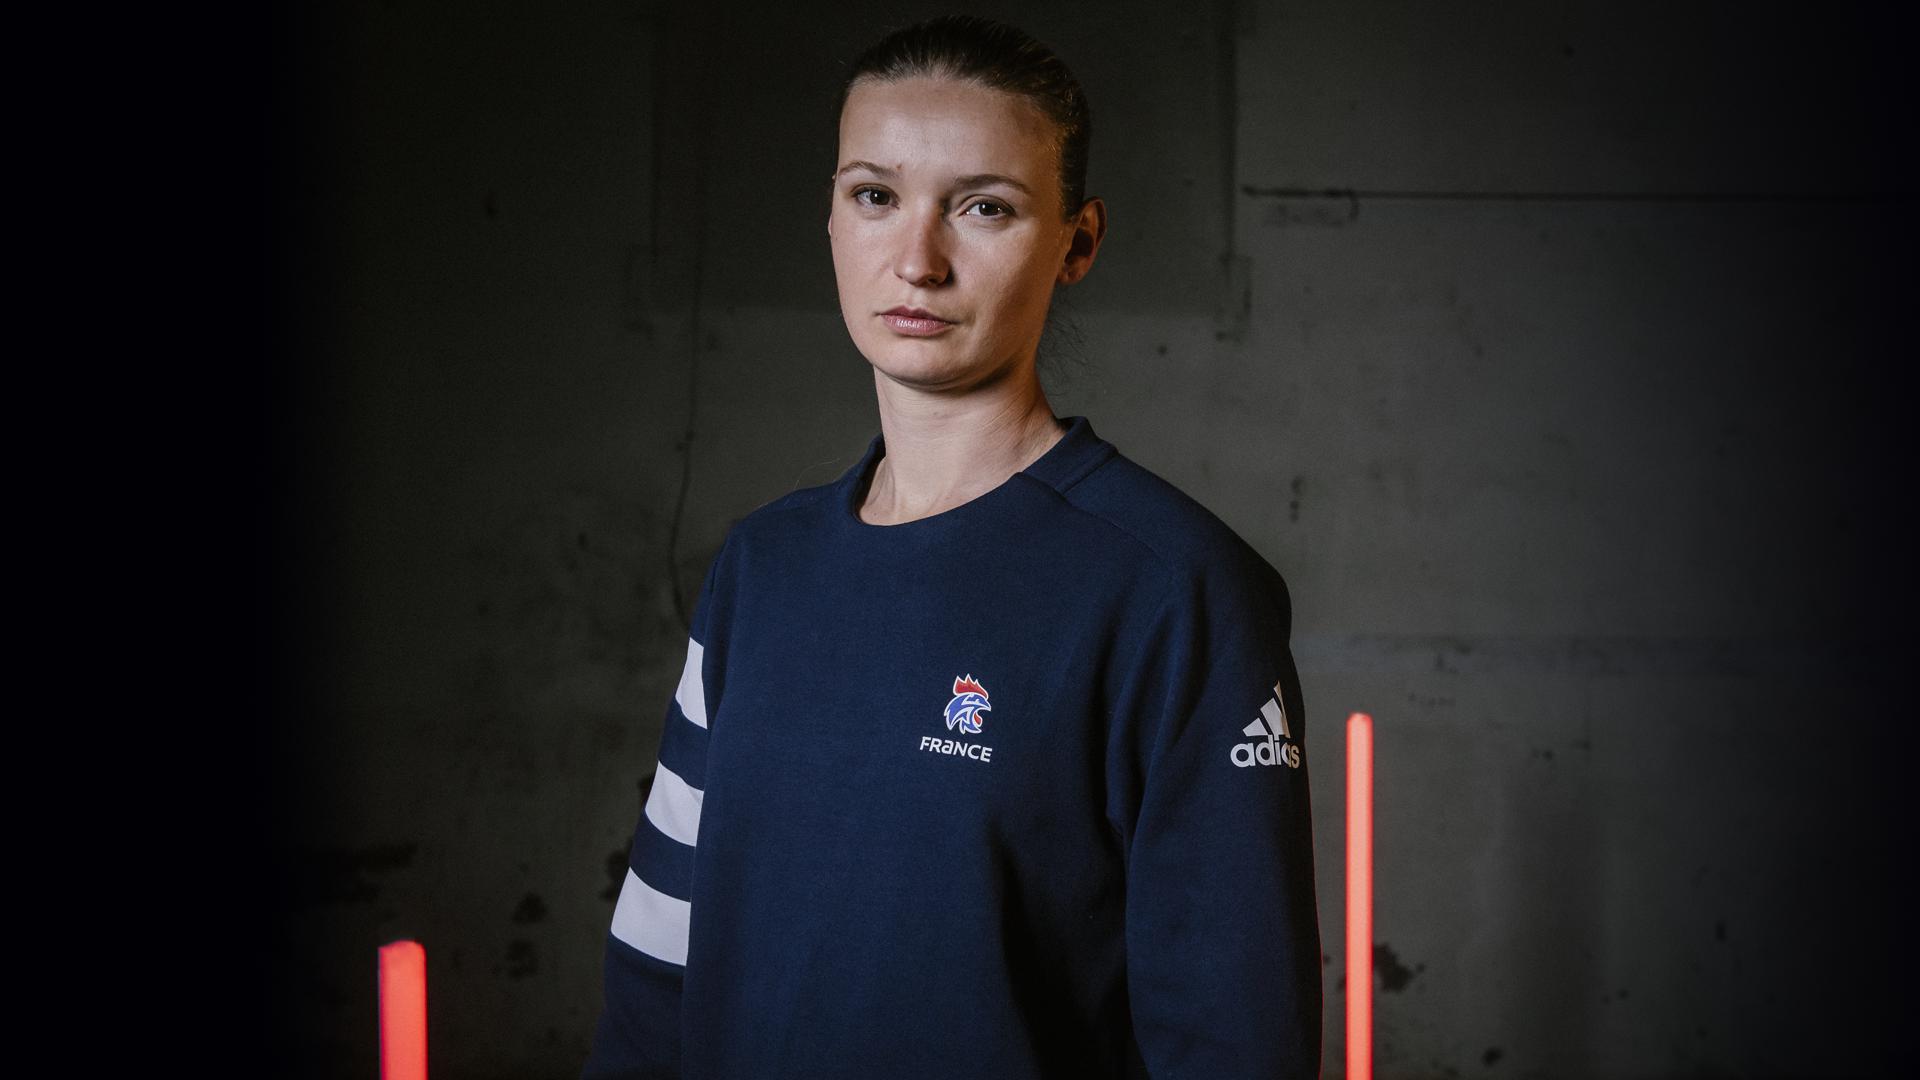 Amandine Leynaud handball adidas equipe de france